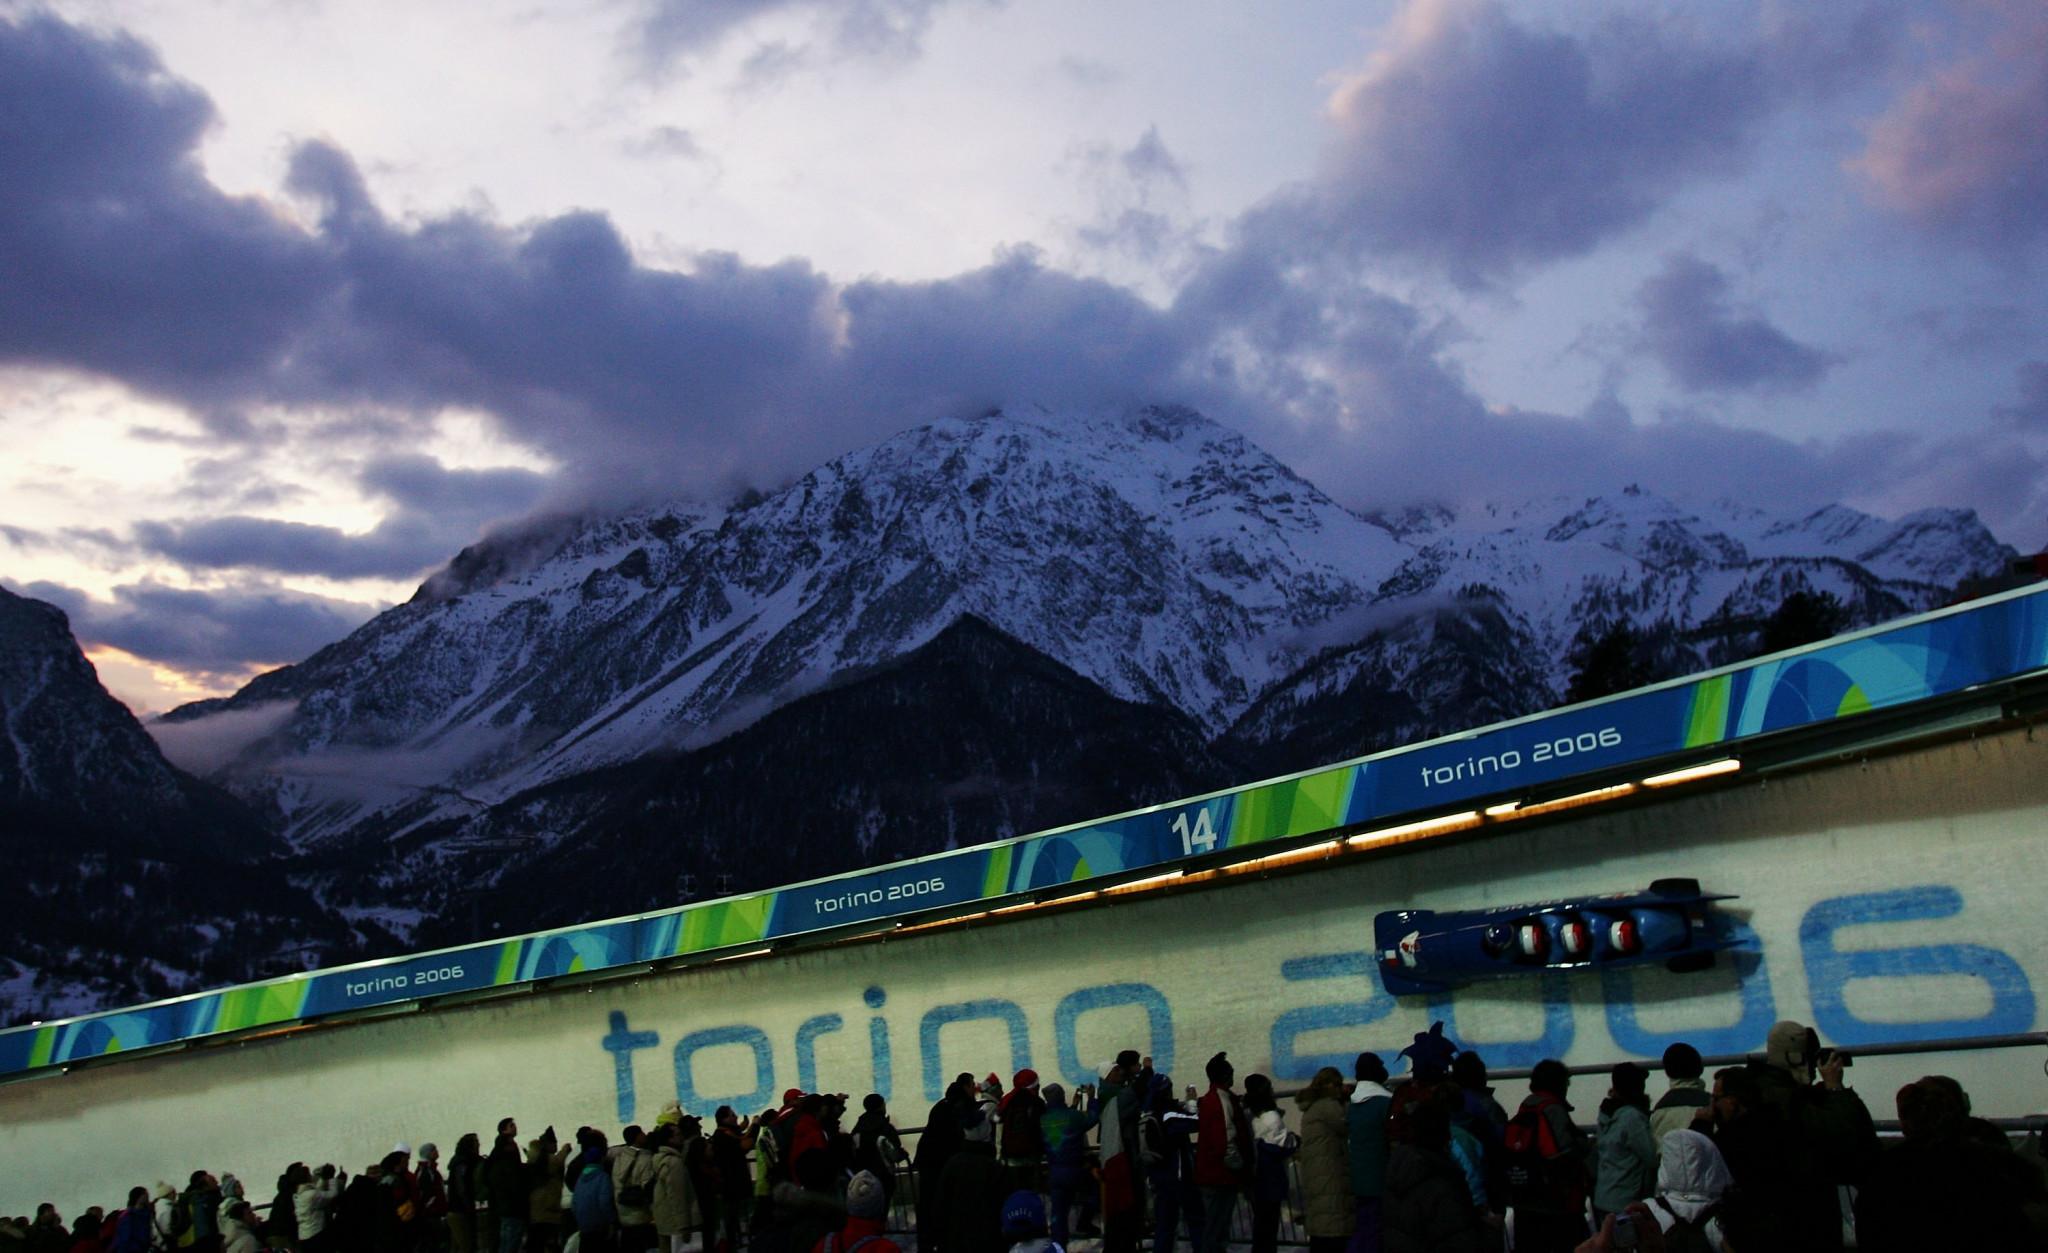 Italy's national teams to train at Turin 2006 sliding venue ahead of new season